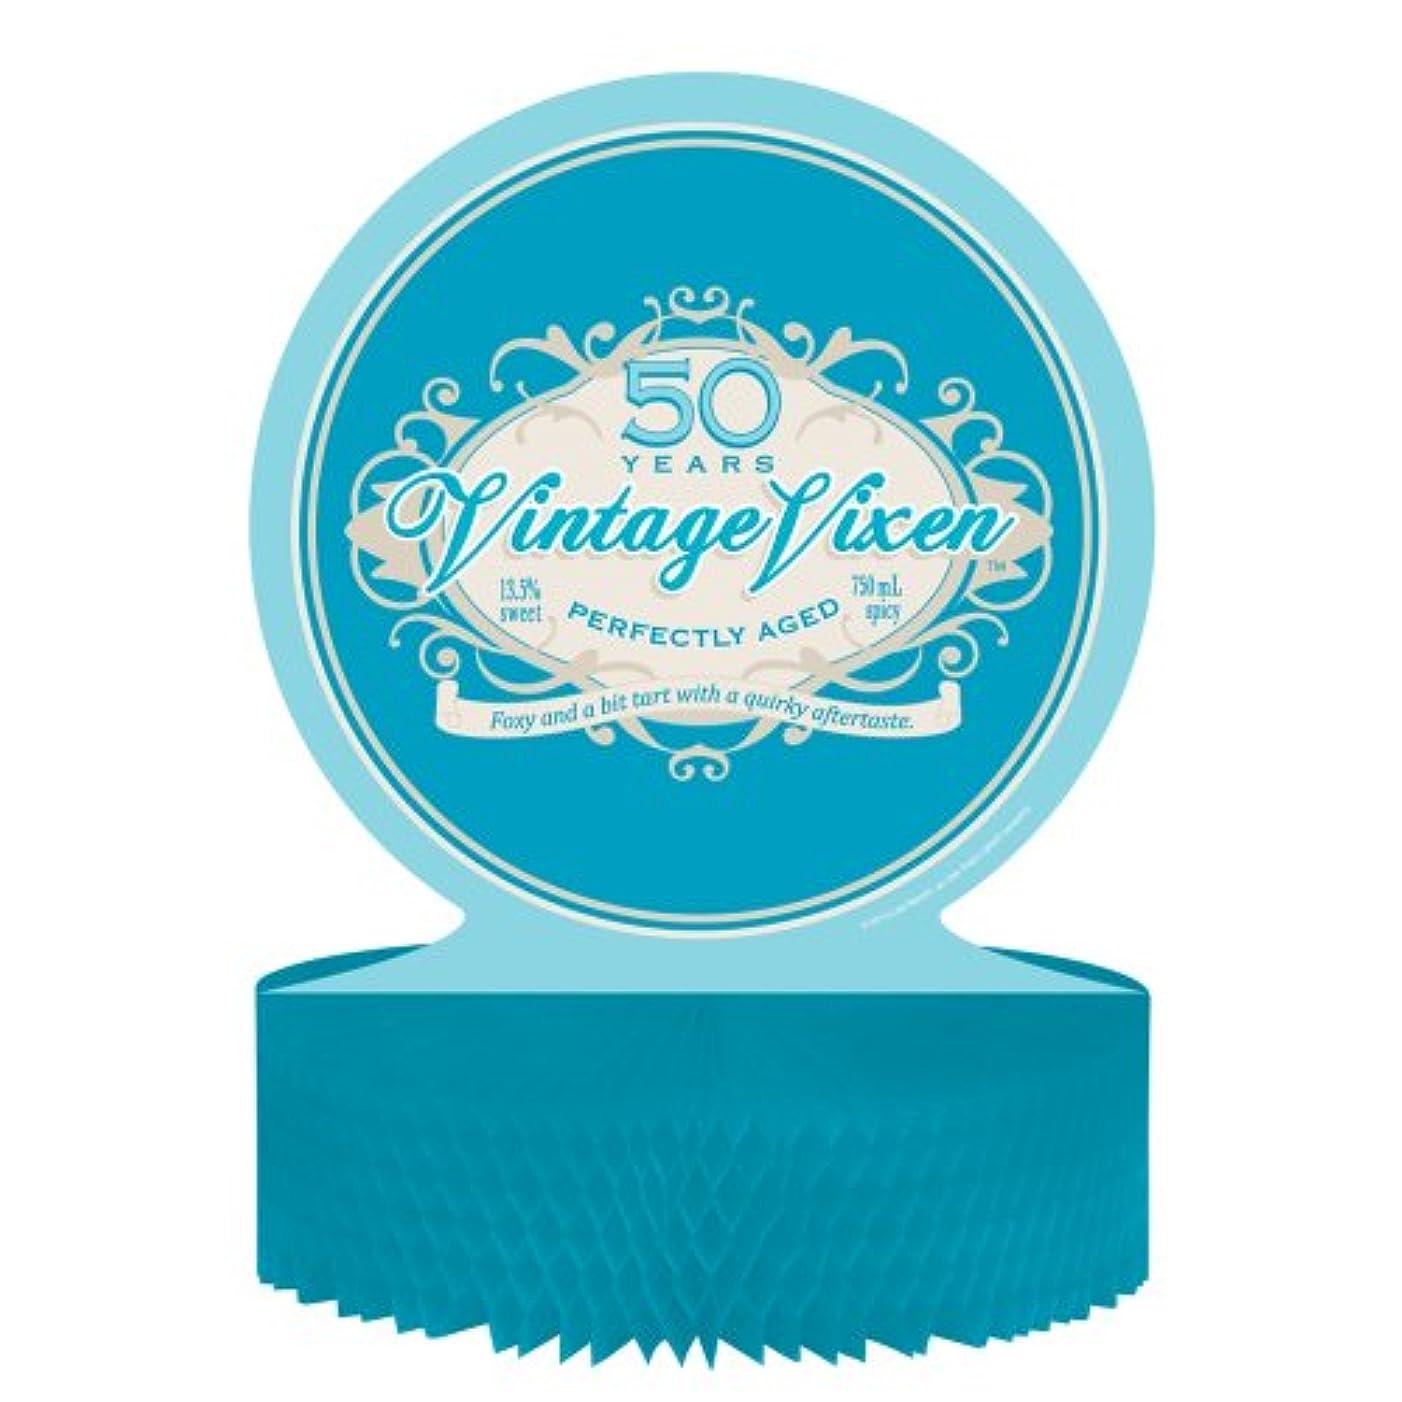 Creative Converting Vintage Vixen 50th Birthday Centerpiece with Honeycomb Base